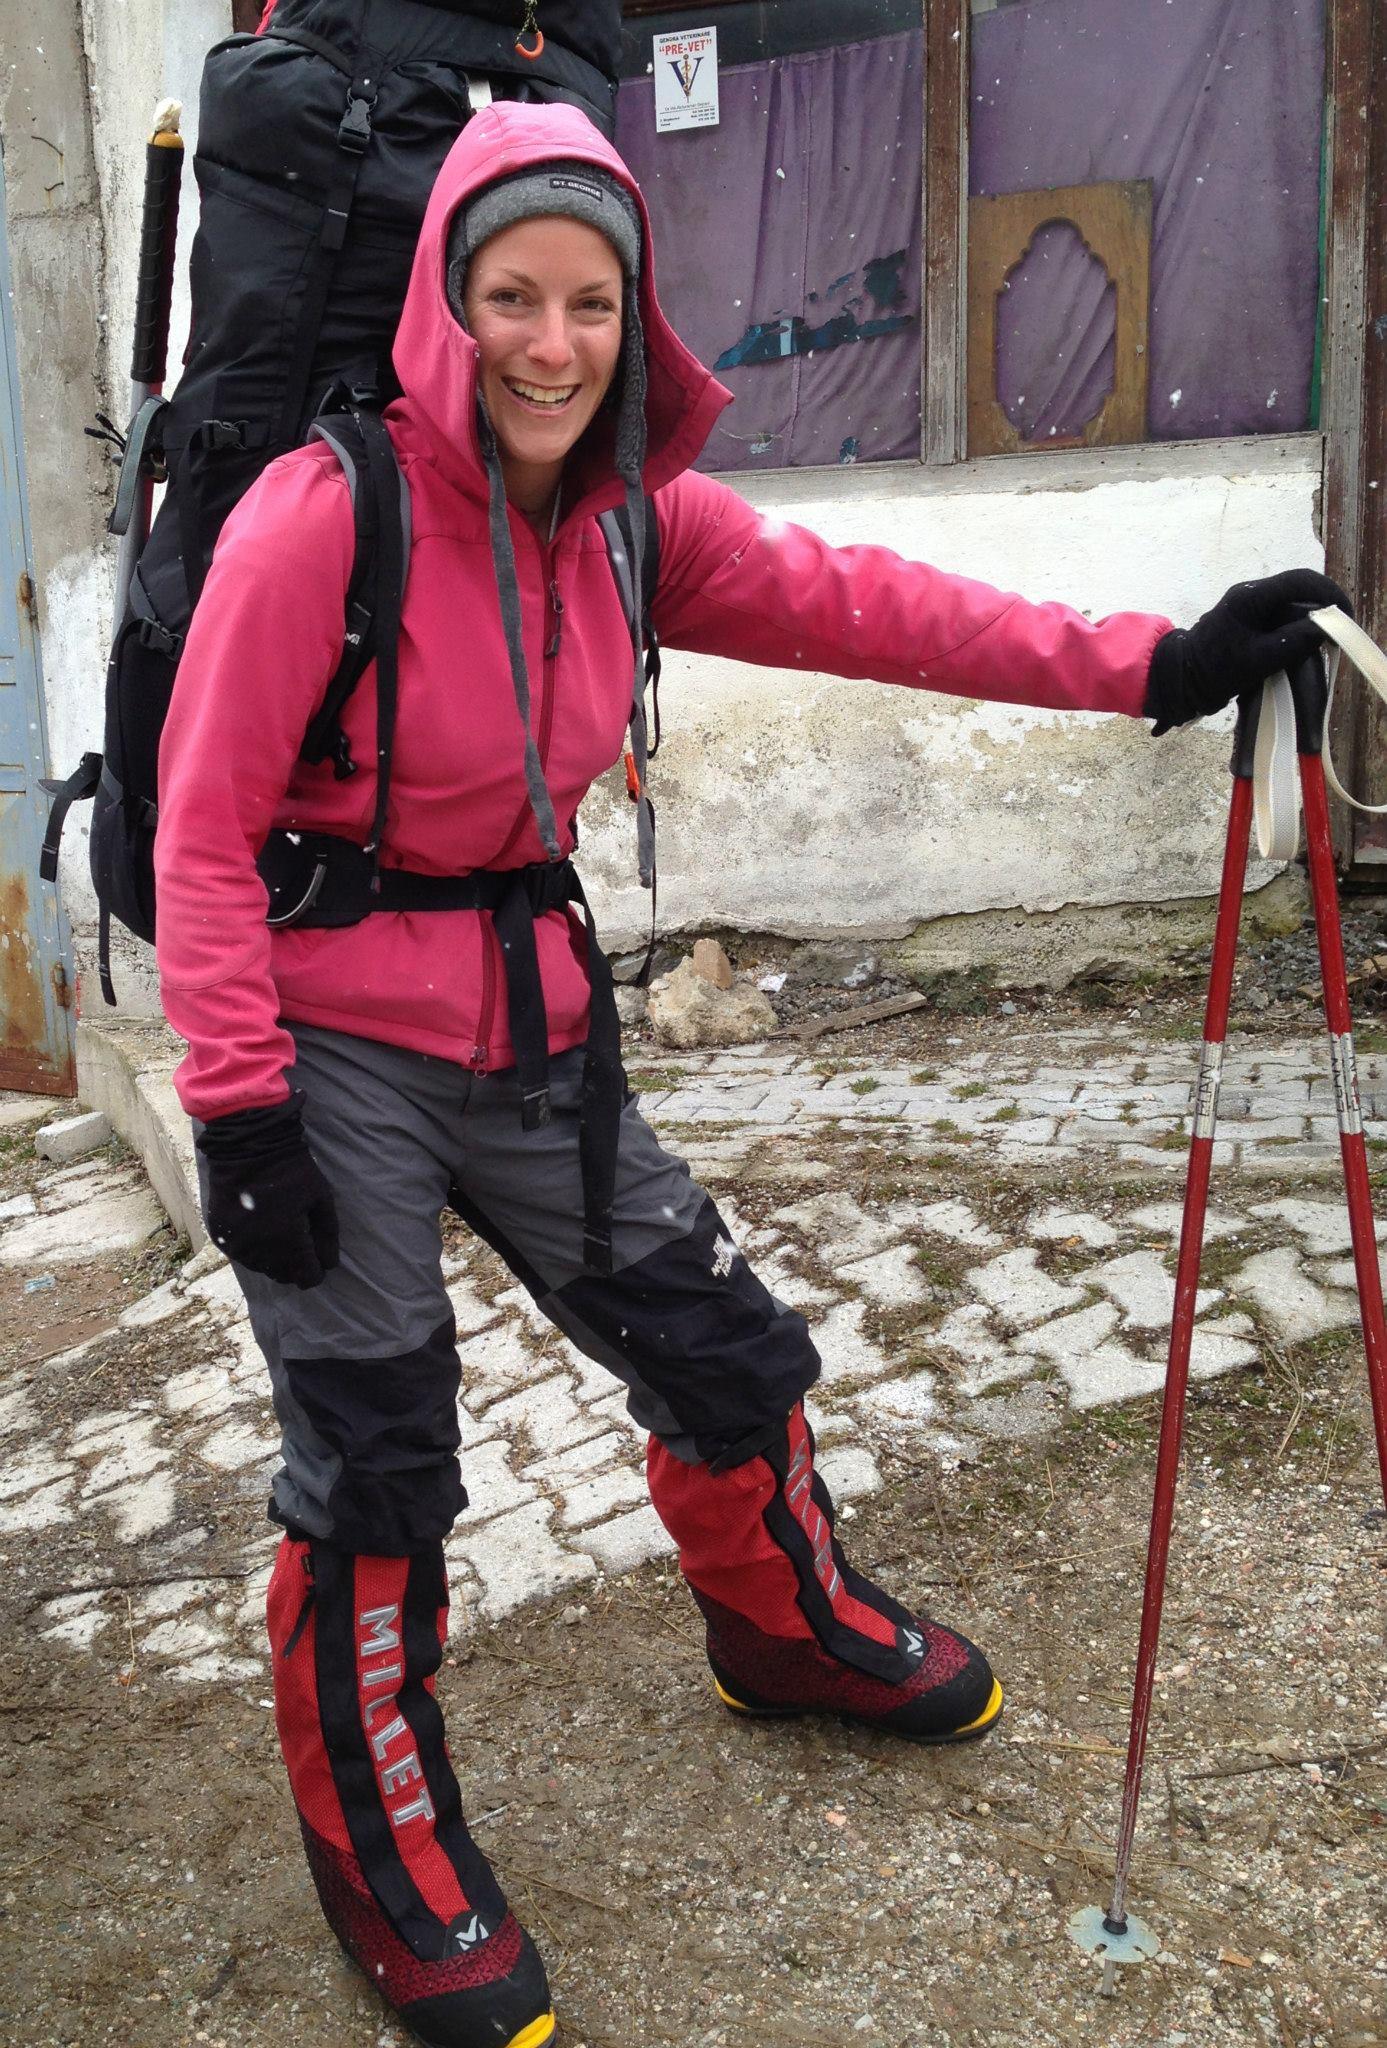 Ilina Arsova posant en tenue d'escalade (Avec l'aimable autorisation d'Ilina Arsova)